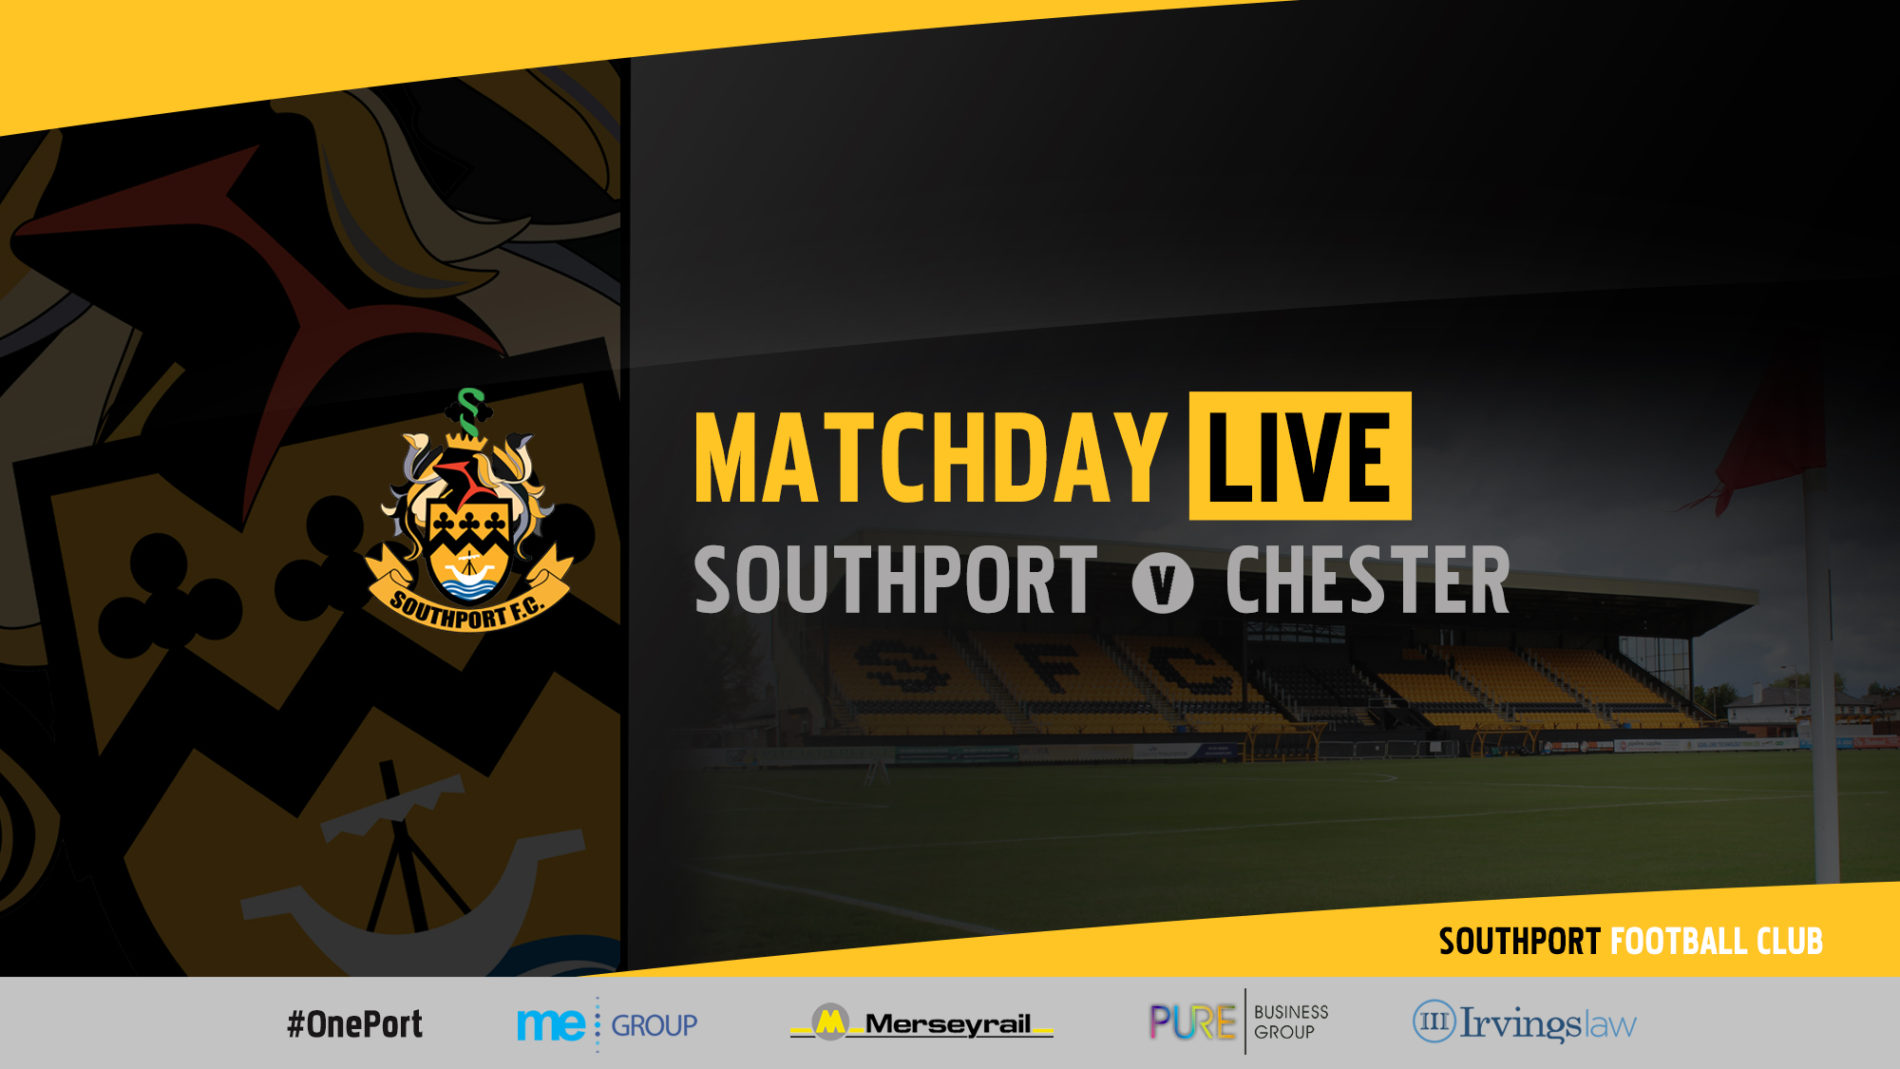 MATCHDAY LIVE | Southport v Chester